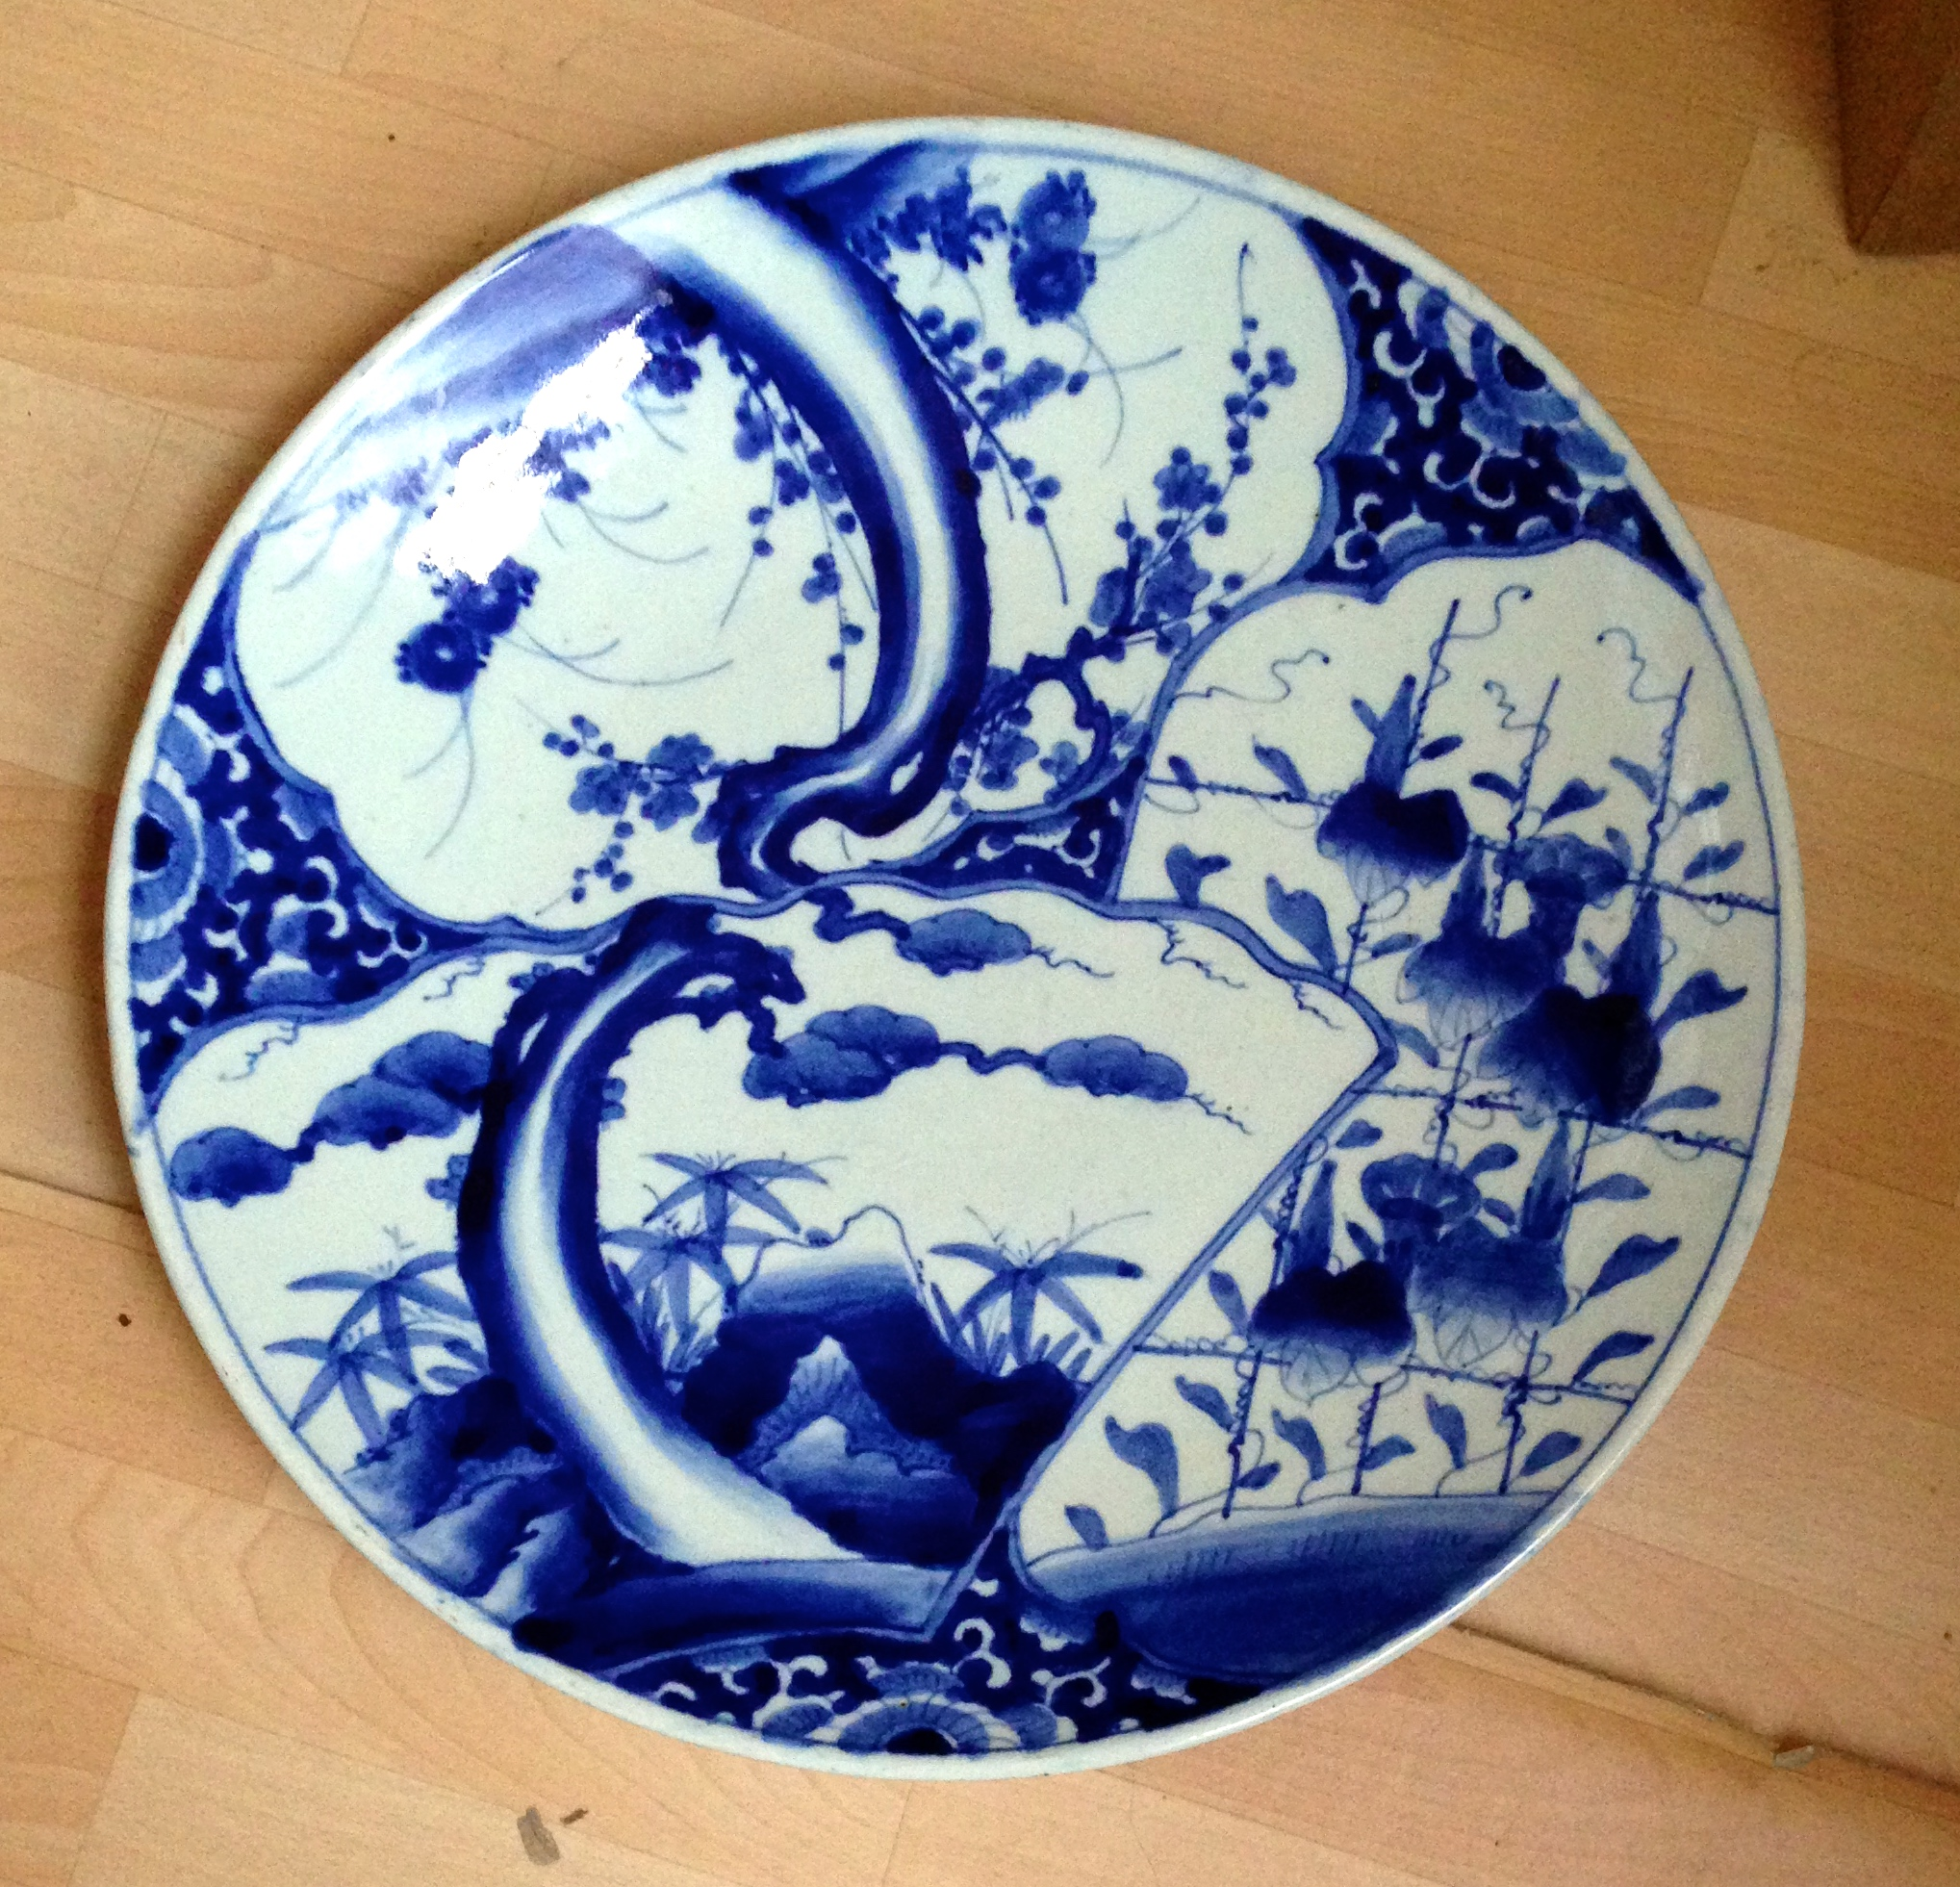 Lot 58 - Large Japanese porcelain charger